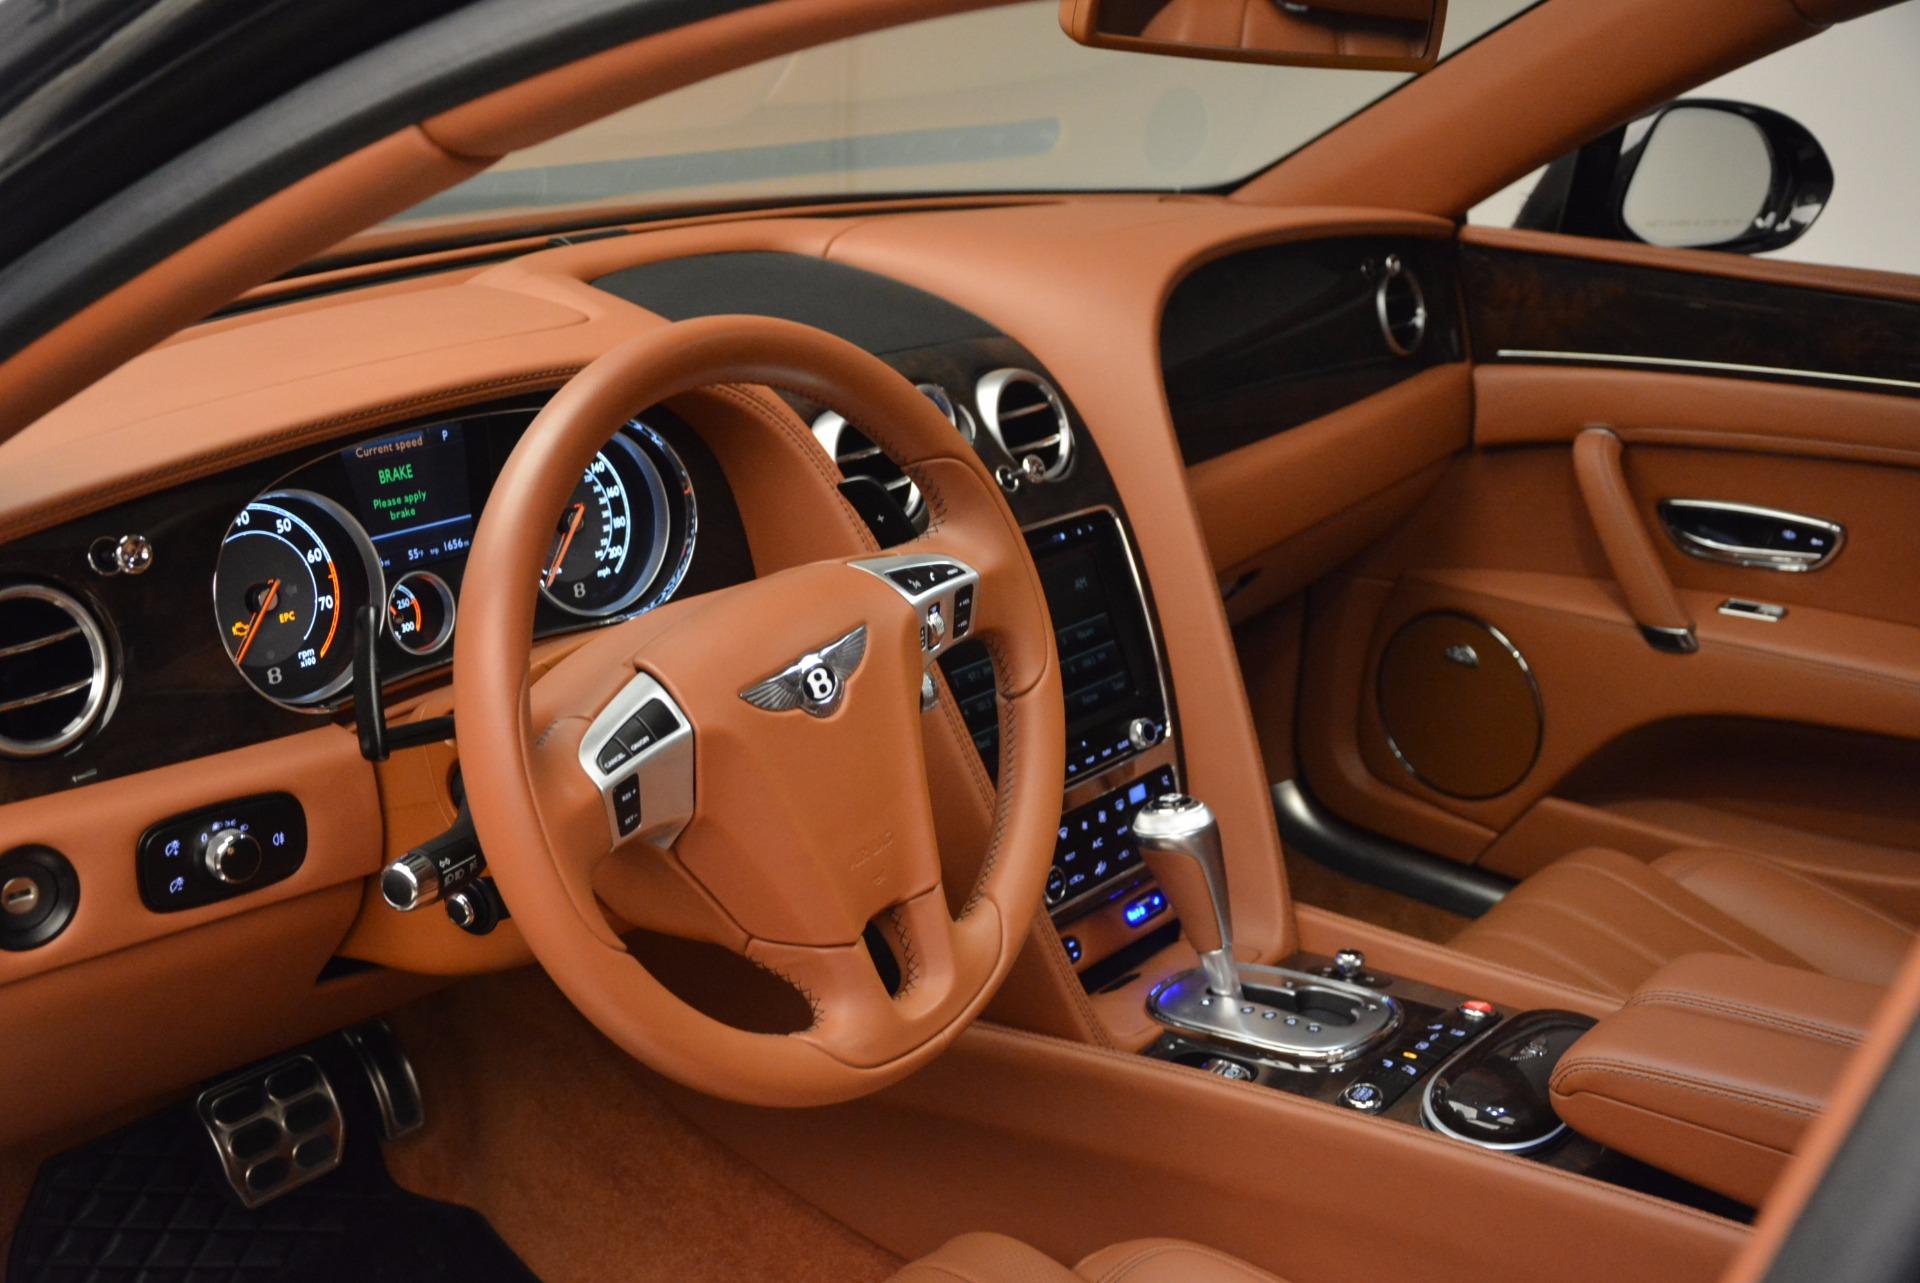 Used 2014 Bentley Flying Spur W12 For Sale In Westport, CT 1598_p29